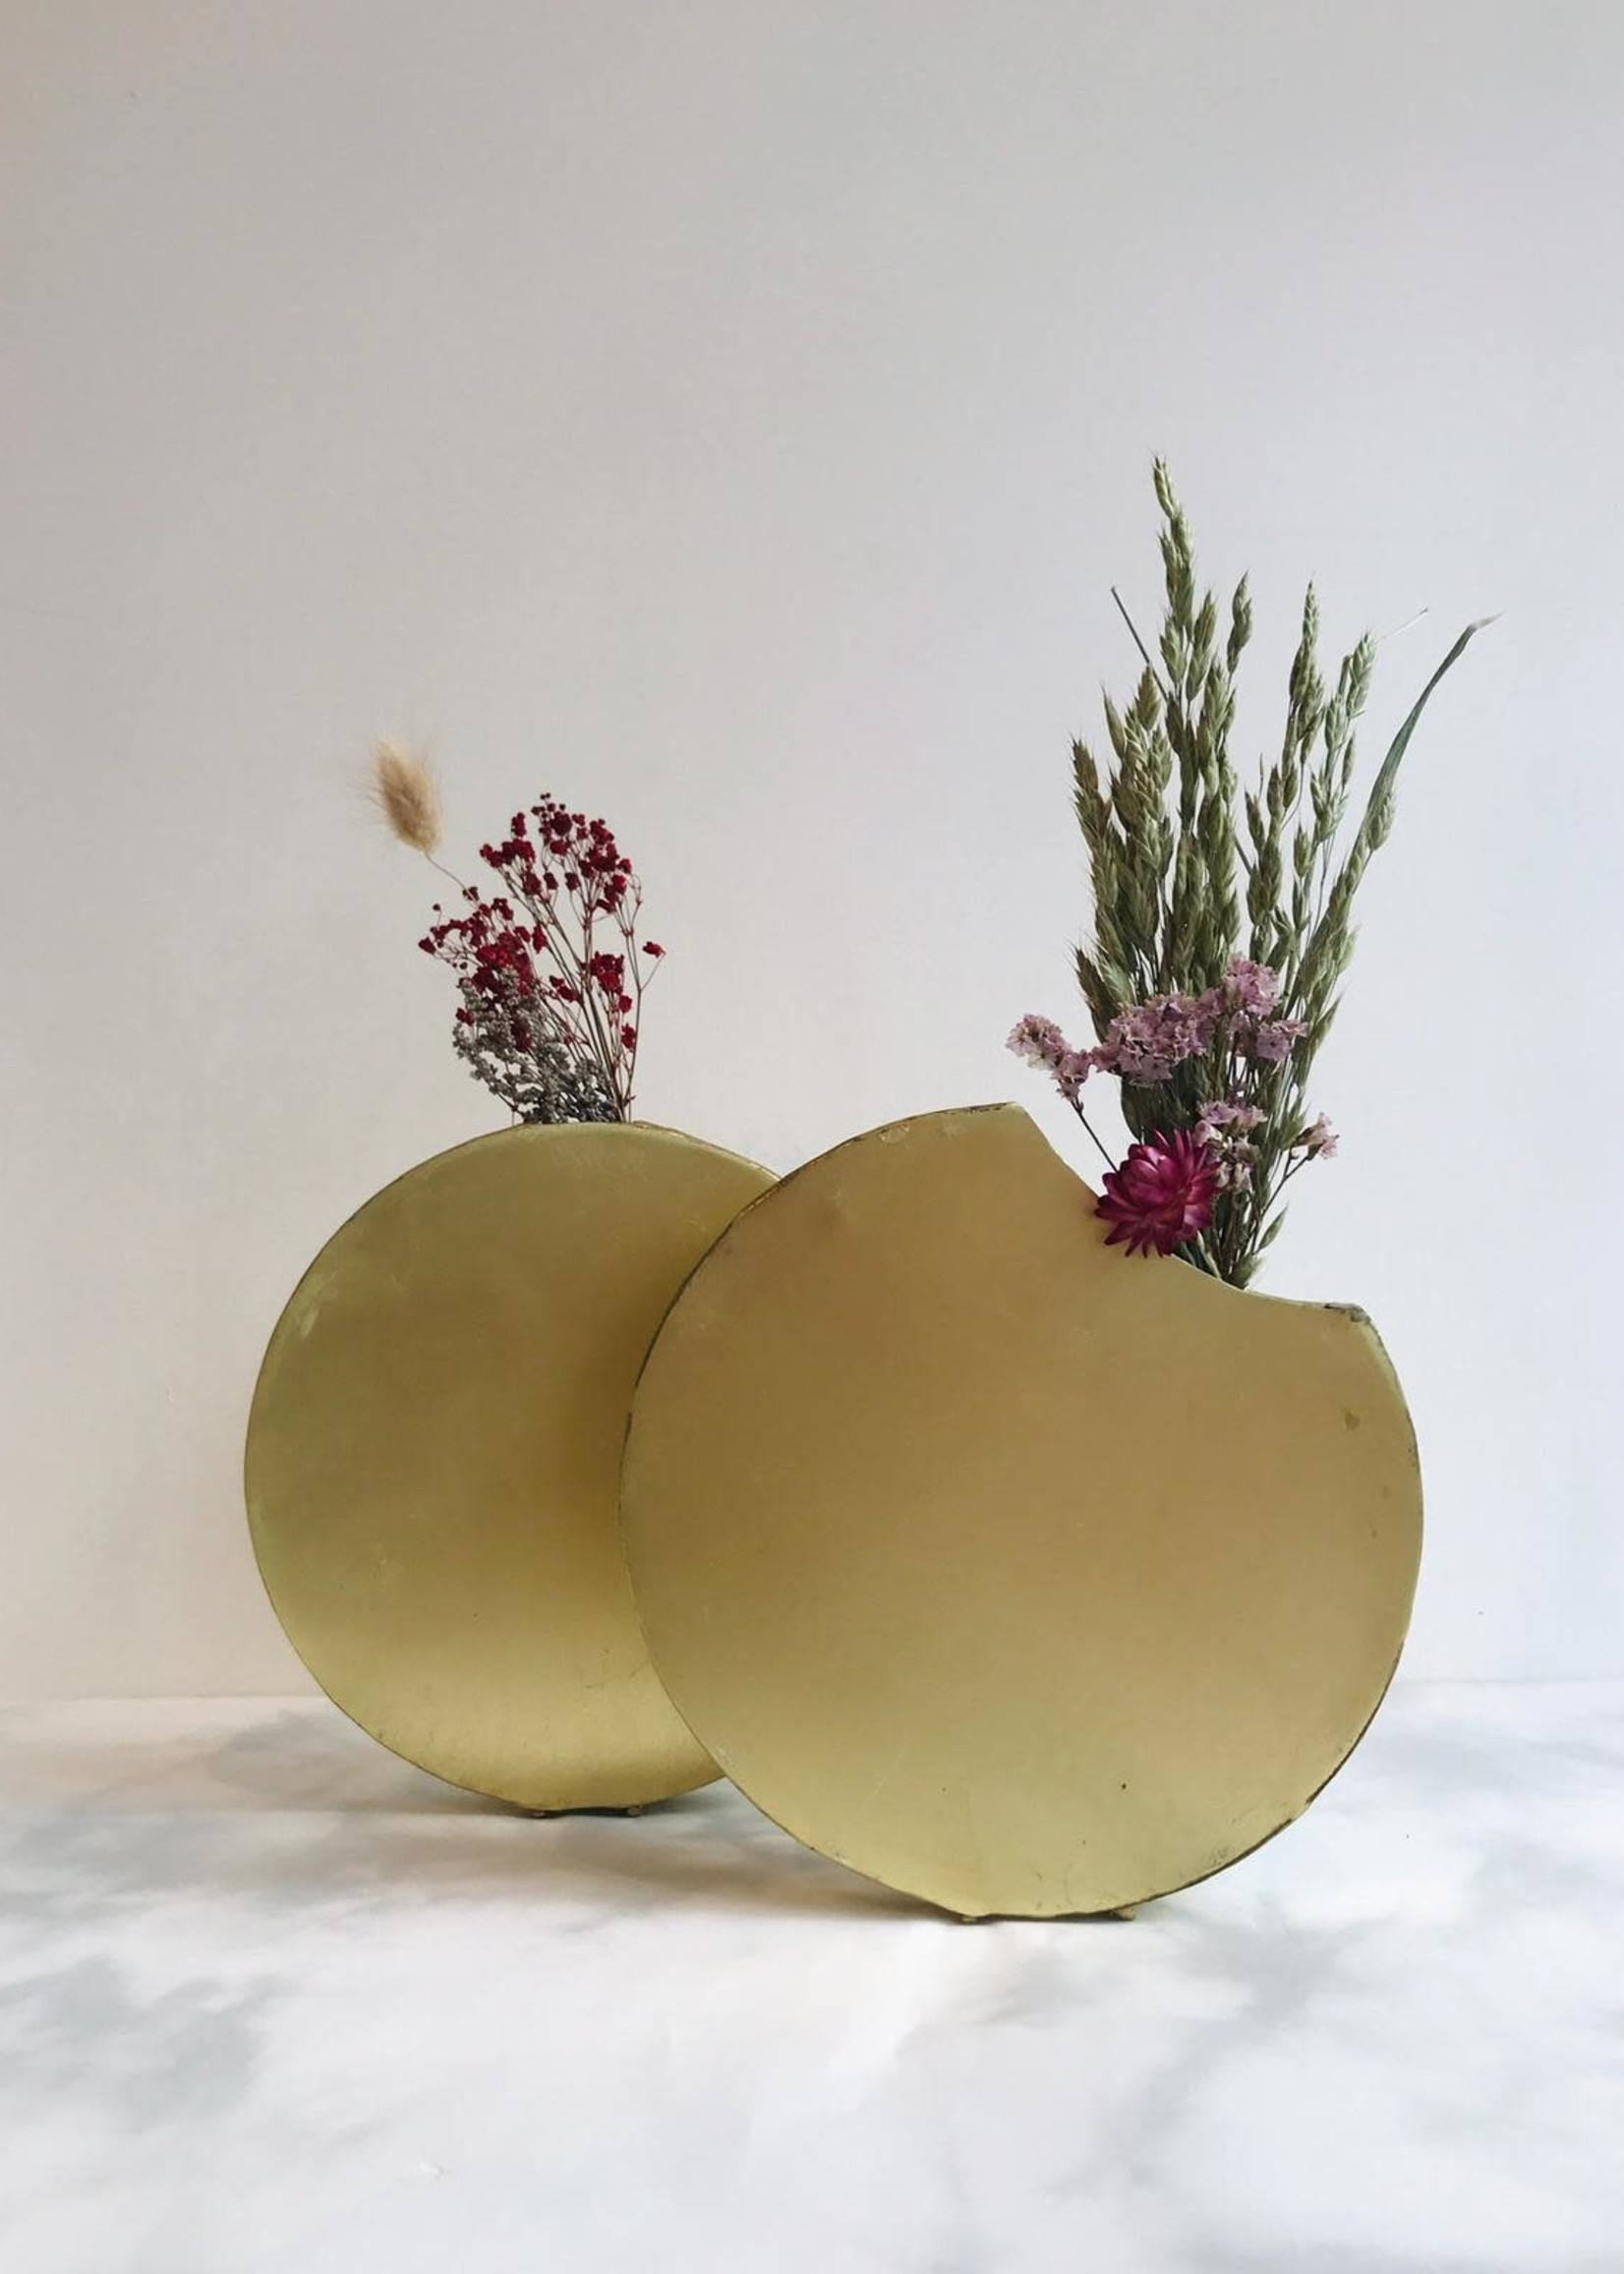 Naman Project Vaas MAAN VOL goud metaal 3 x 18 x 18 cm